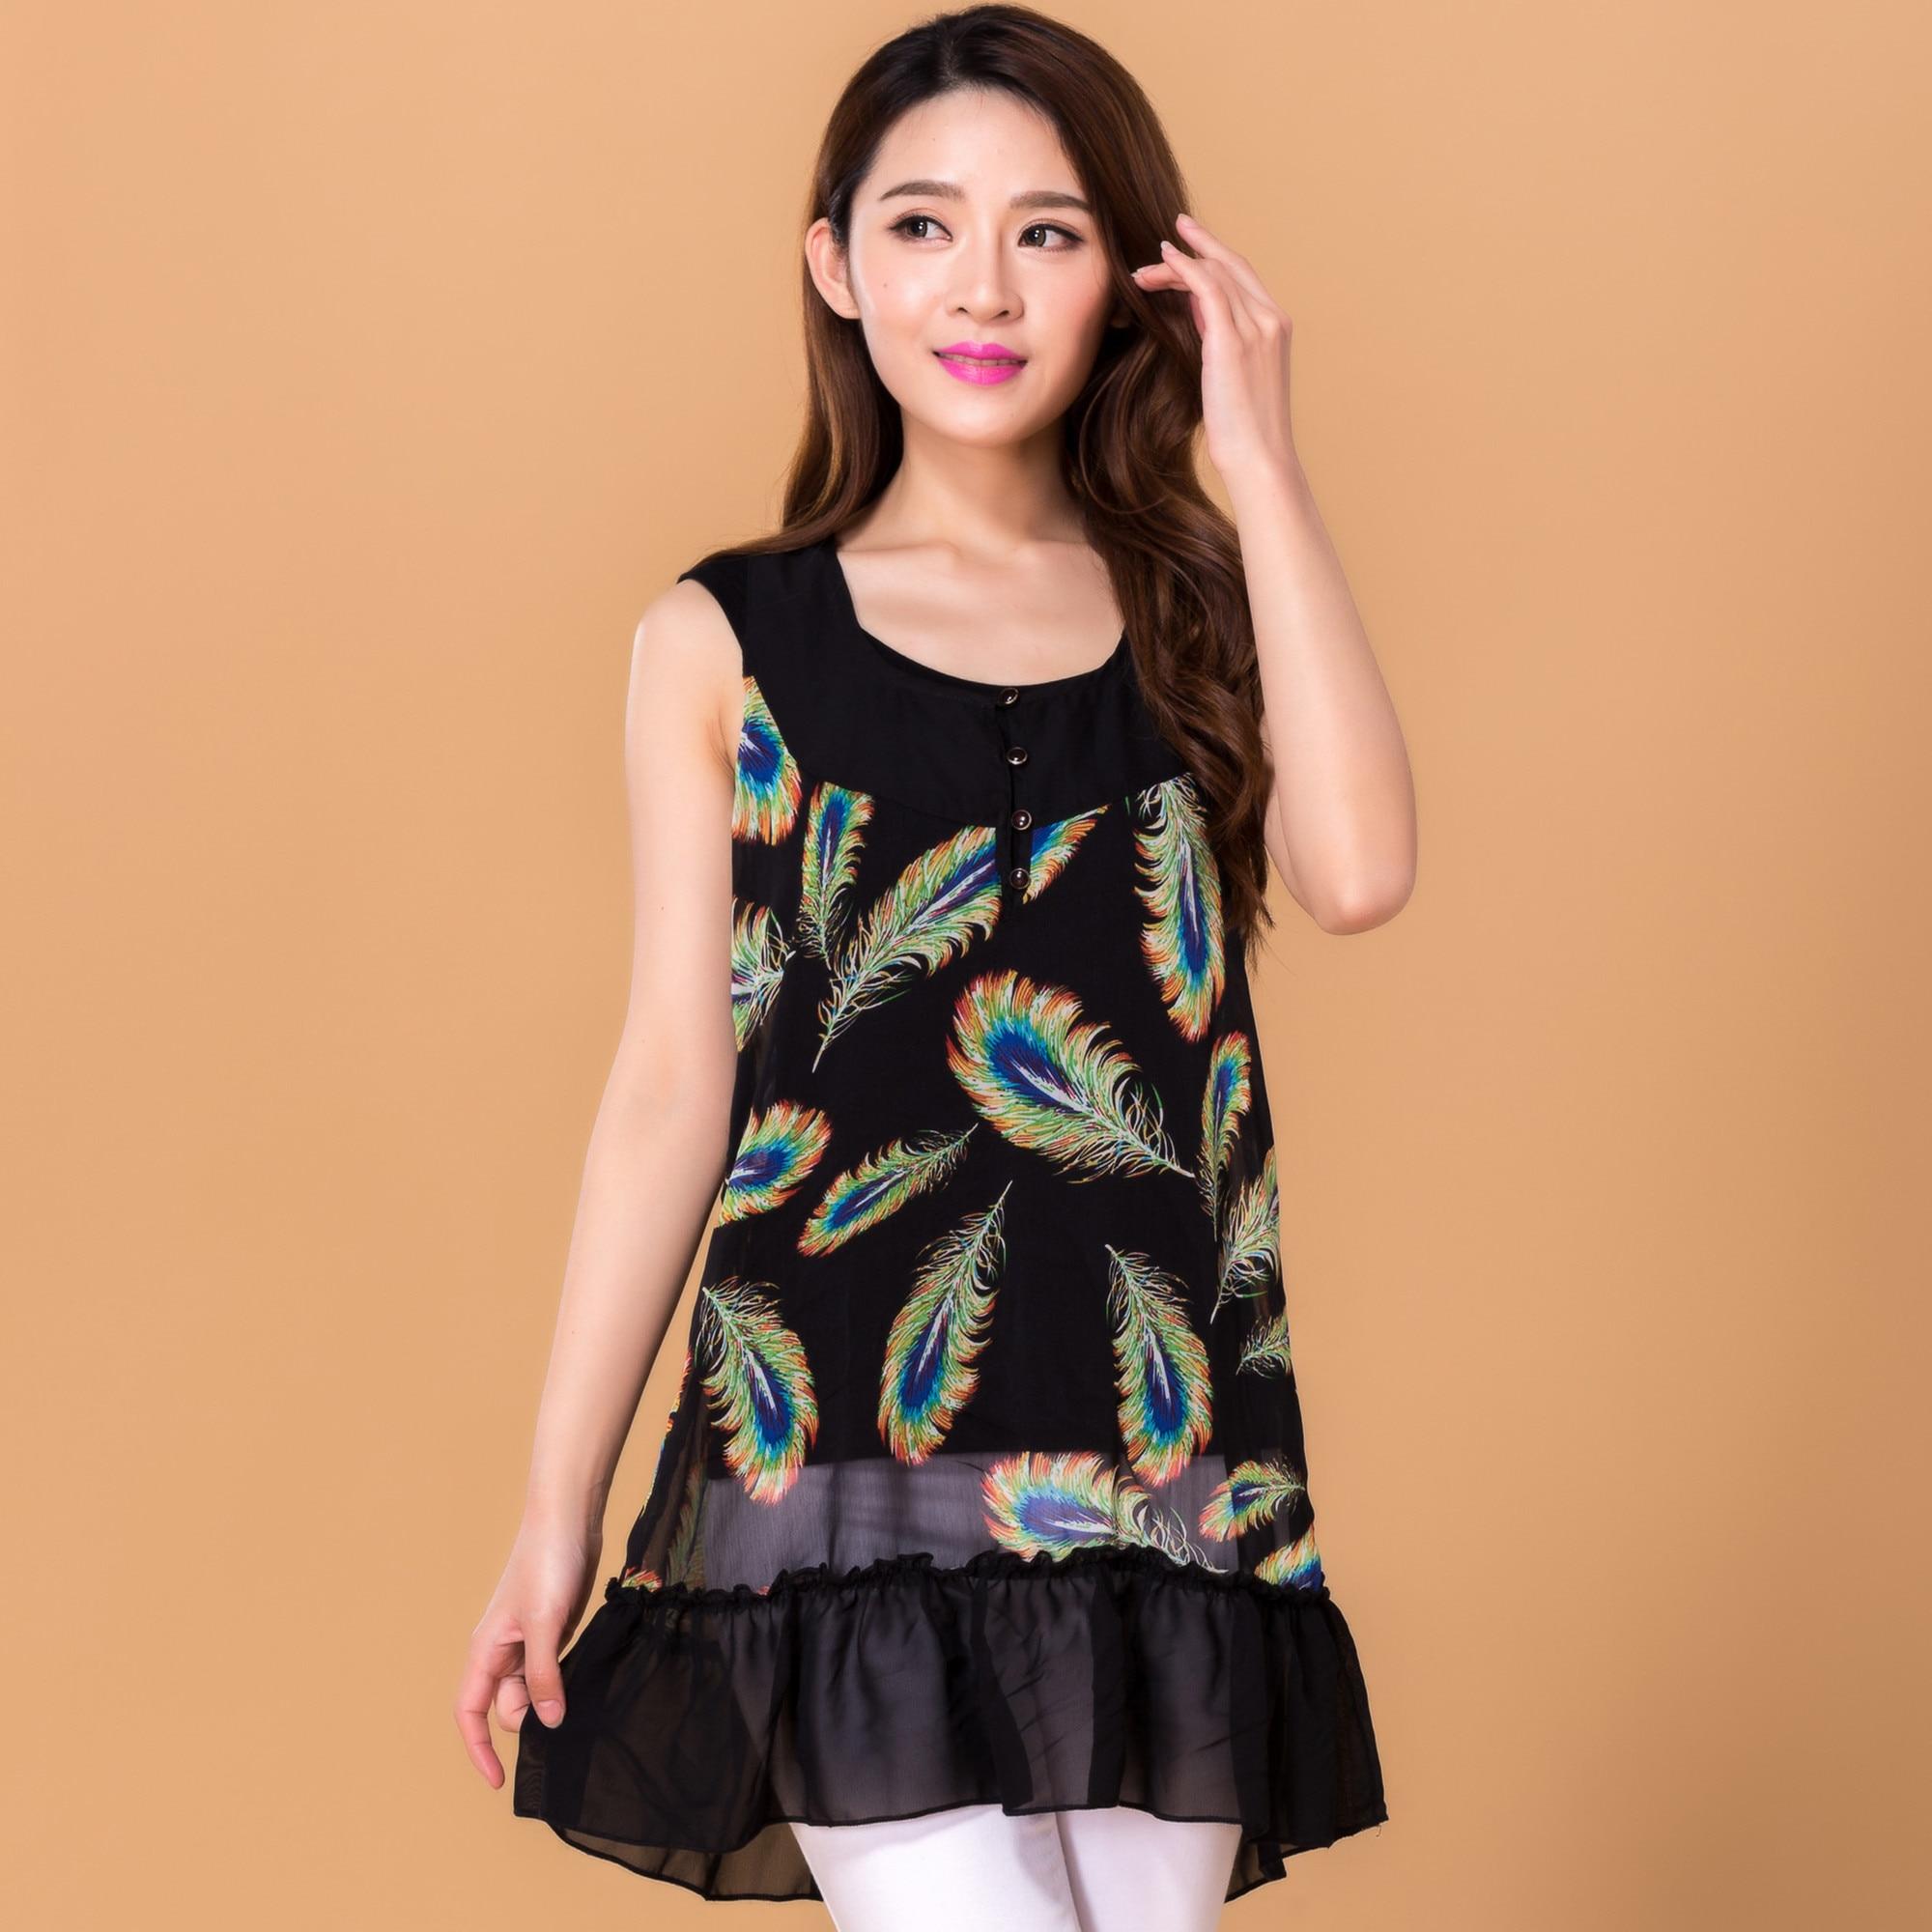 TC Fashion Girl Women Casual Chiffon Vest Shirt Summer Tops Black Ladies Blouses Clothes Femininas Camisas Clothing Female